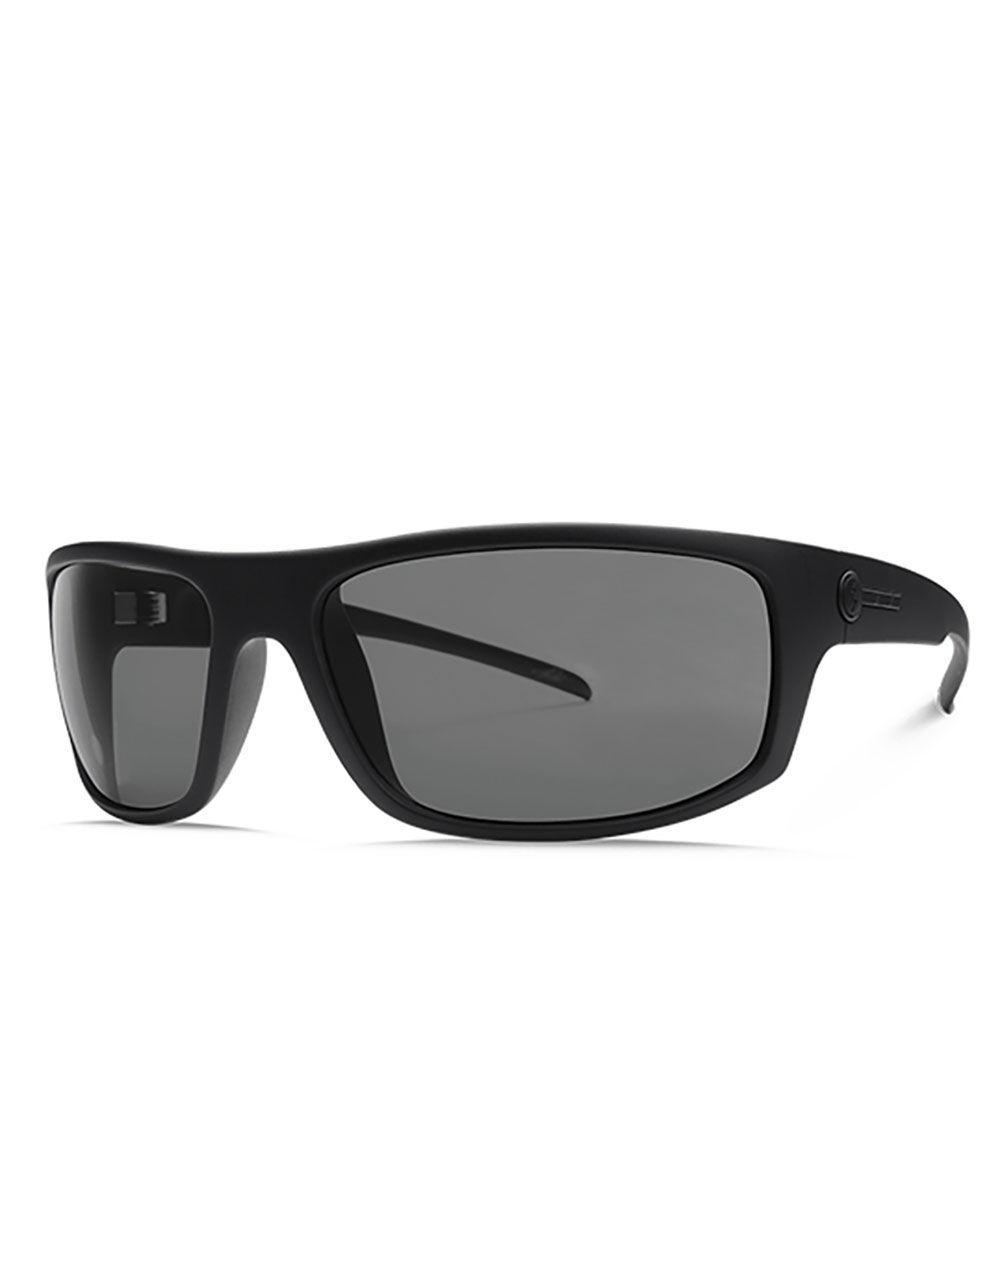 bbf899a940e4 Lyst - Electric Tech One Polarized Sunglasses for Men